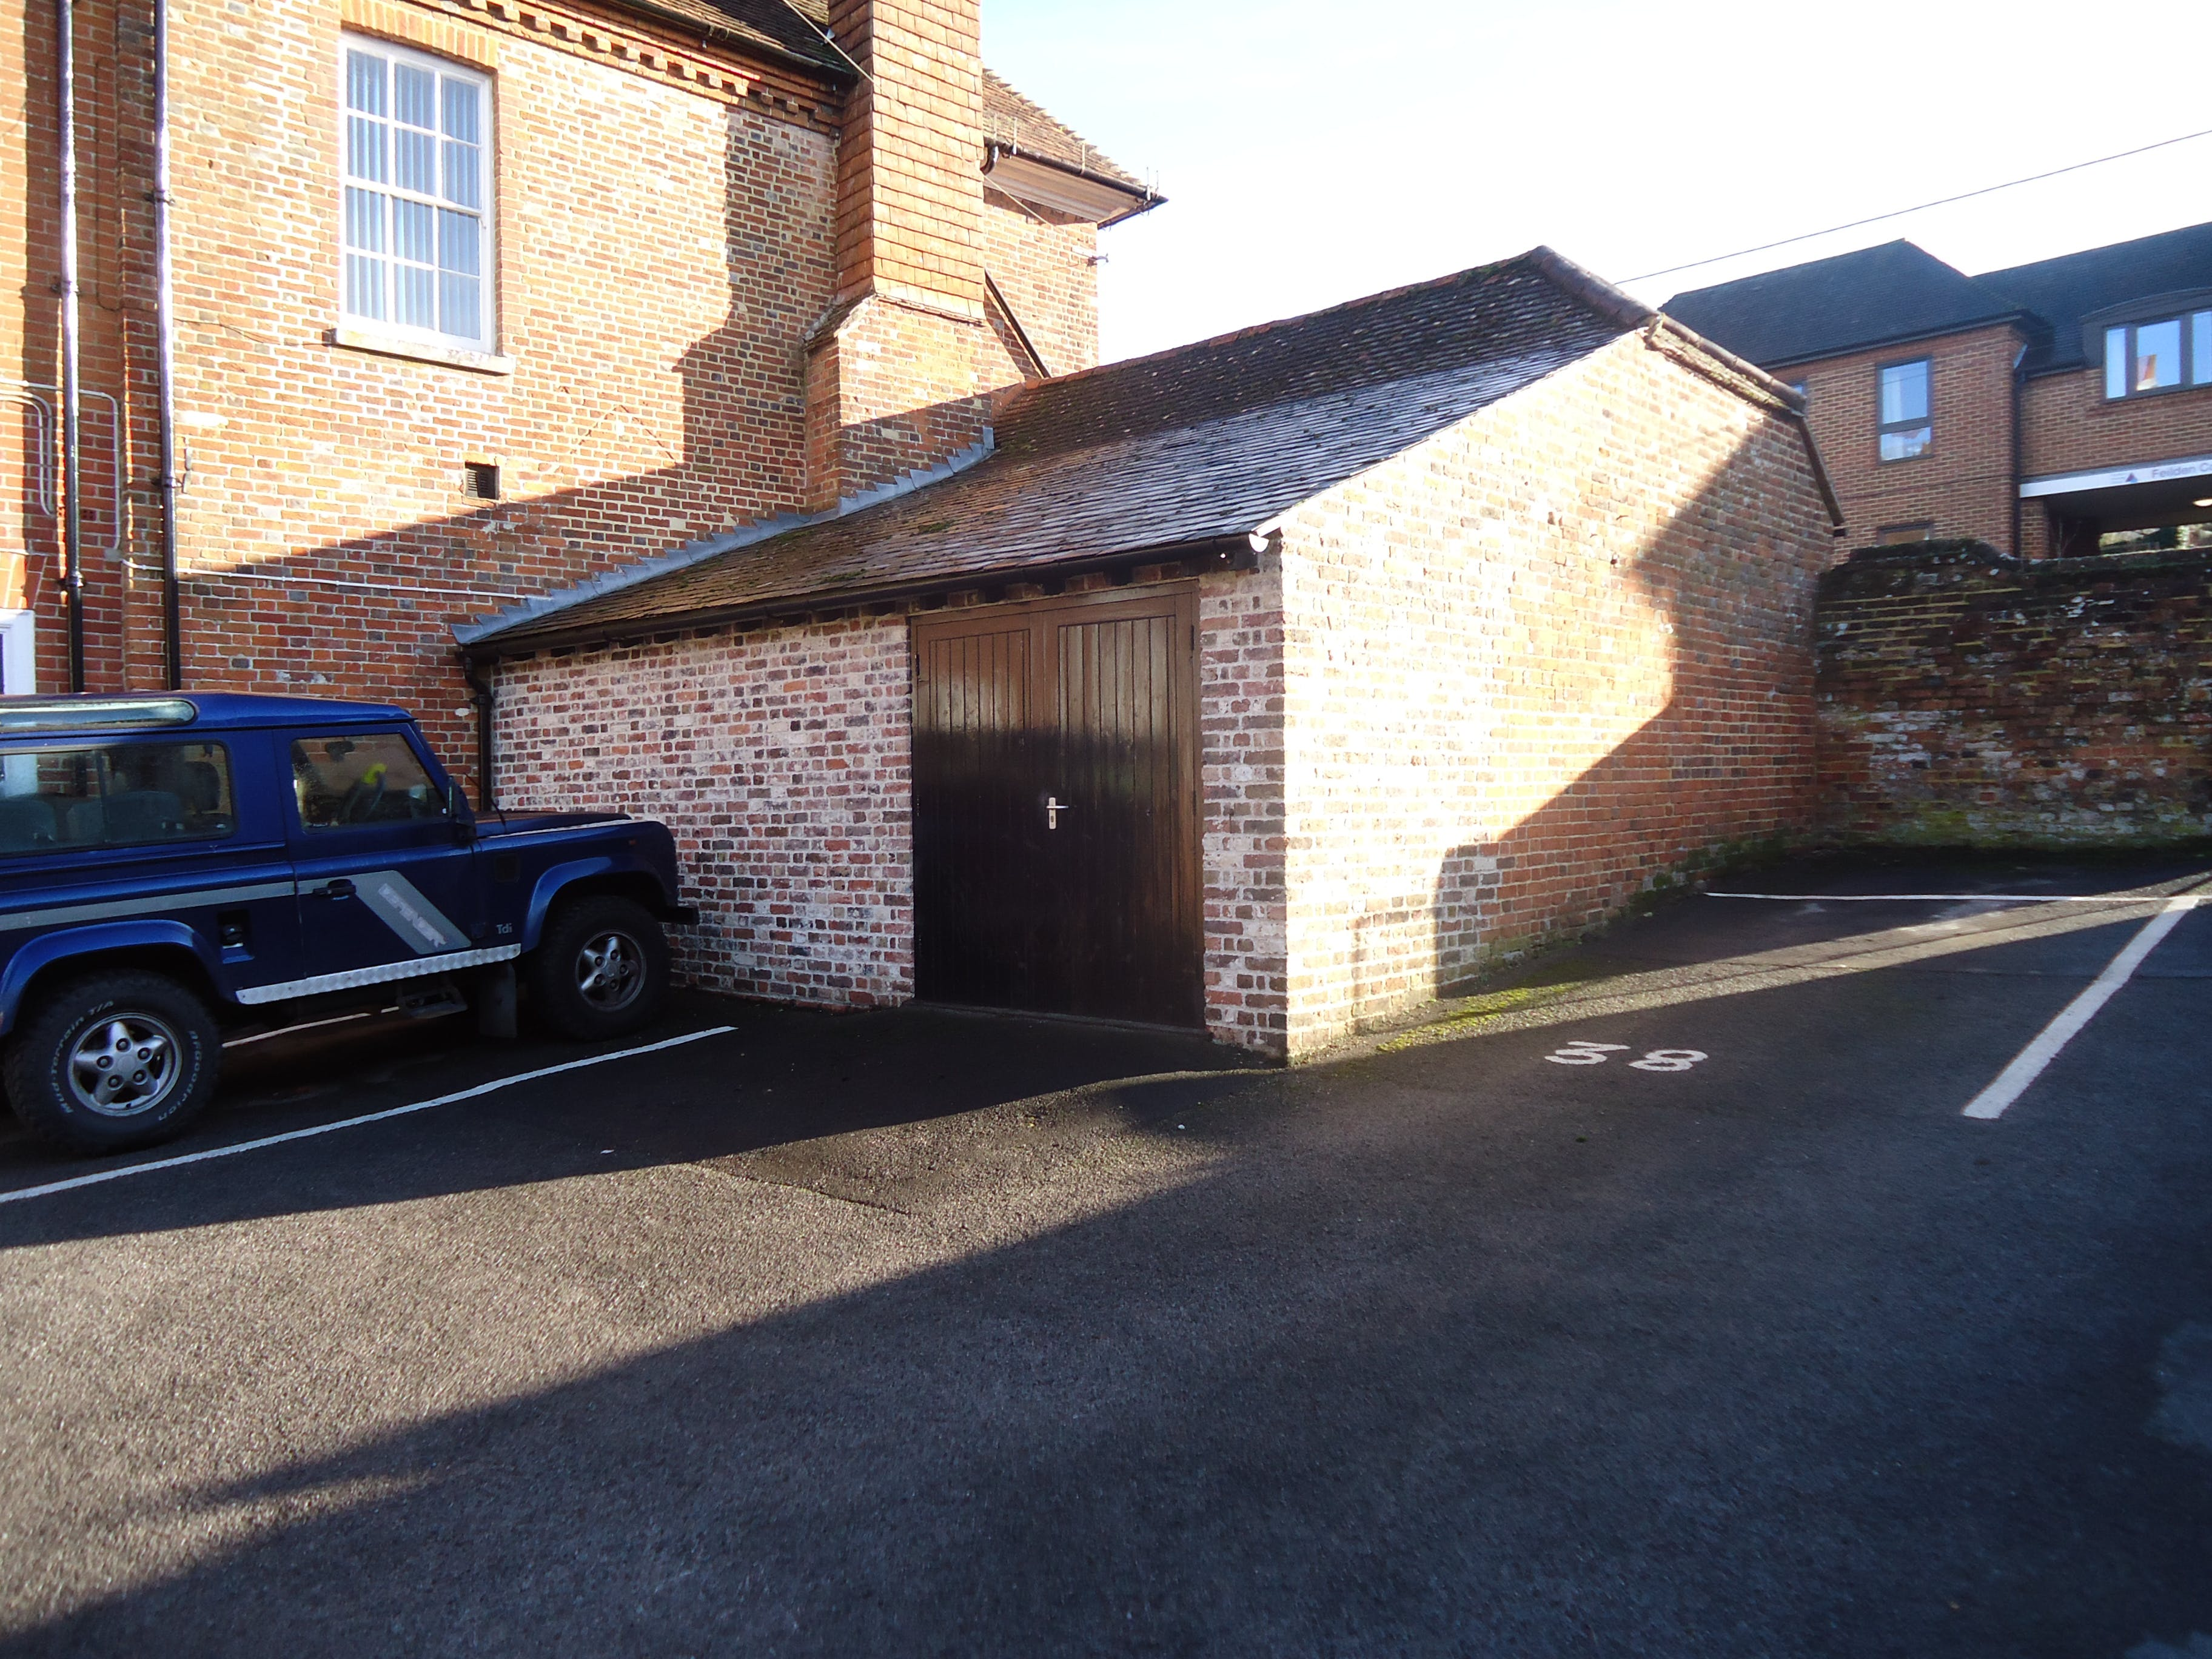 24 Swan Street Kingsclere, 24 Swan Street, Newbury, Development (Land & Buildings) / Investments / Offices For Sale - DSC00007.JPG